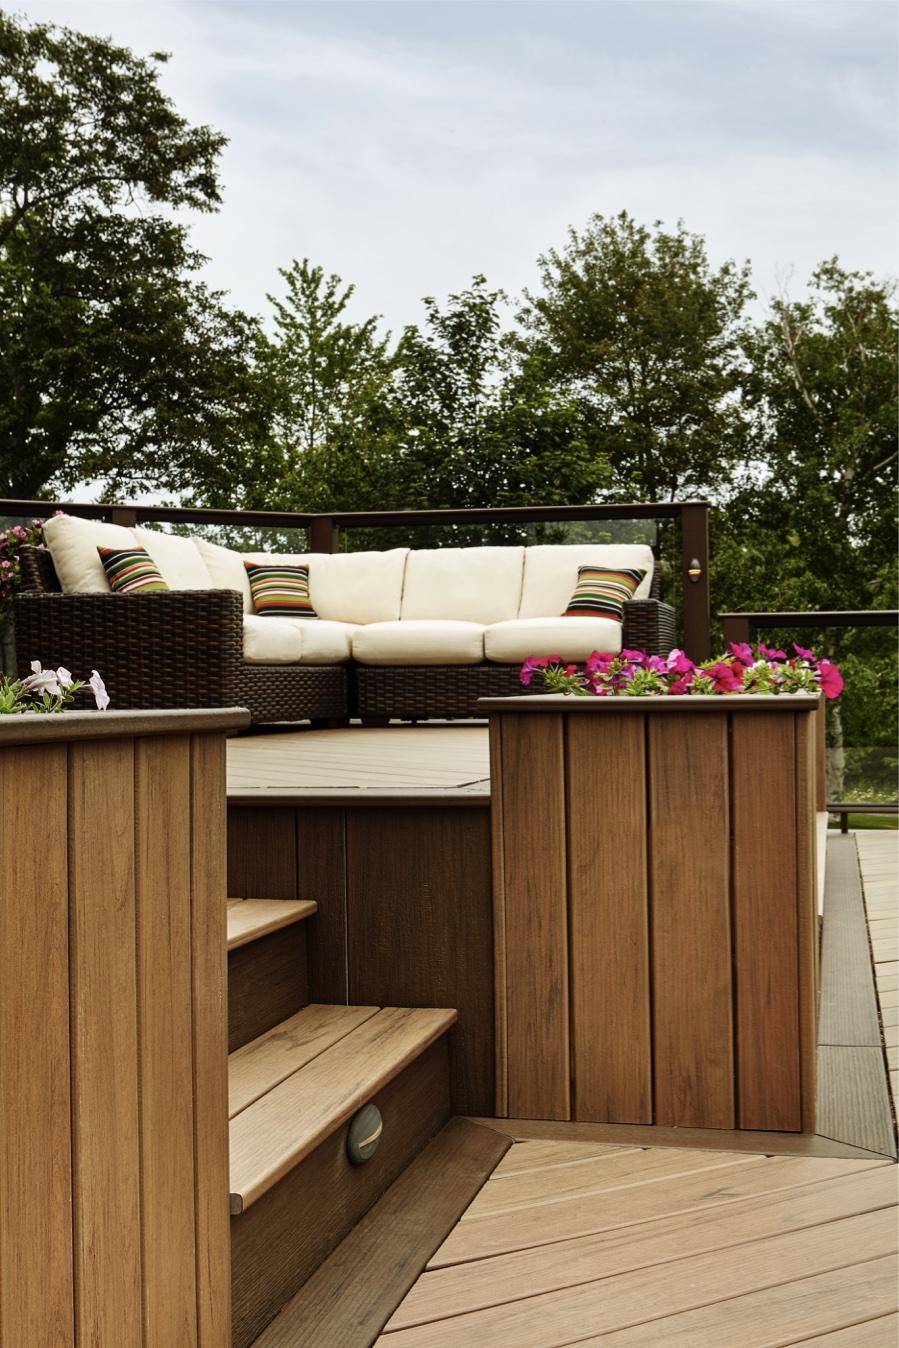 Deck photos deck designs plans timbertech australia baanklon Choice Image